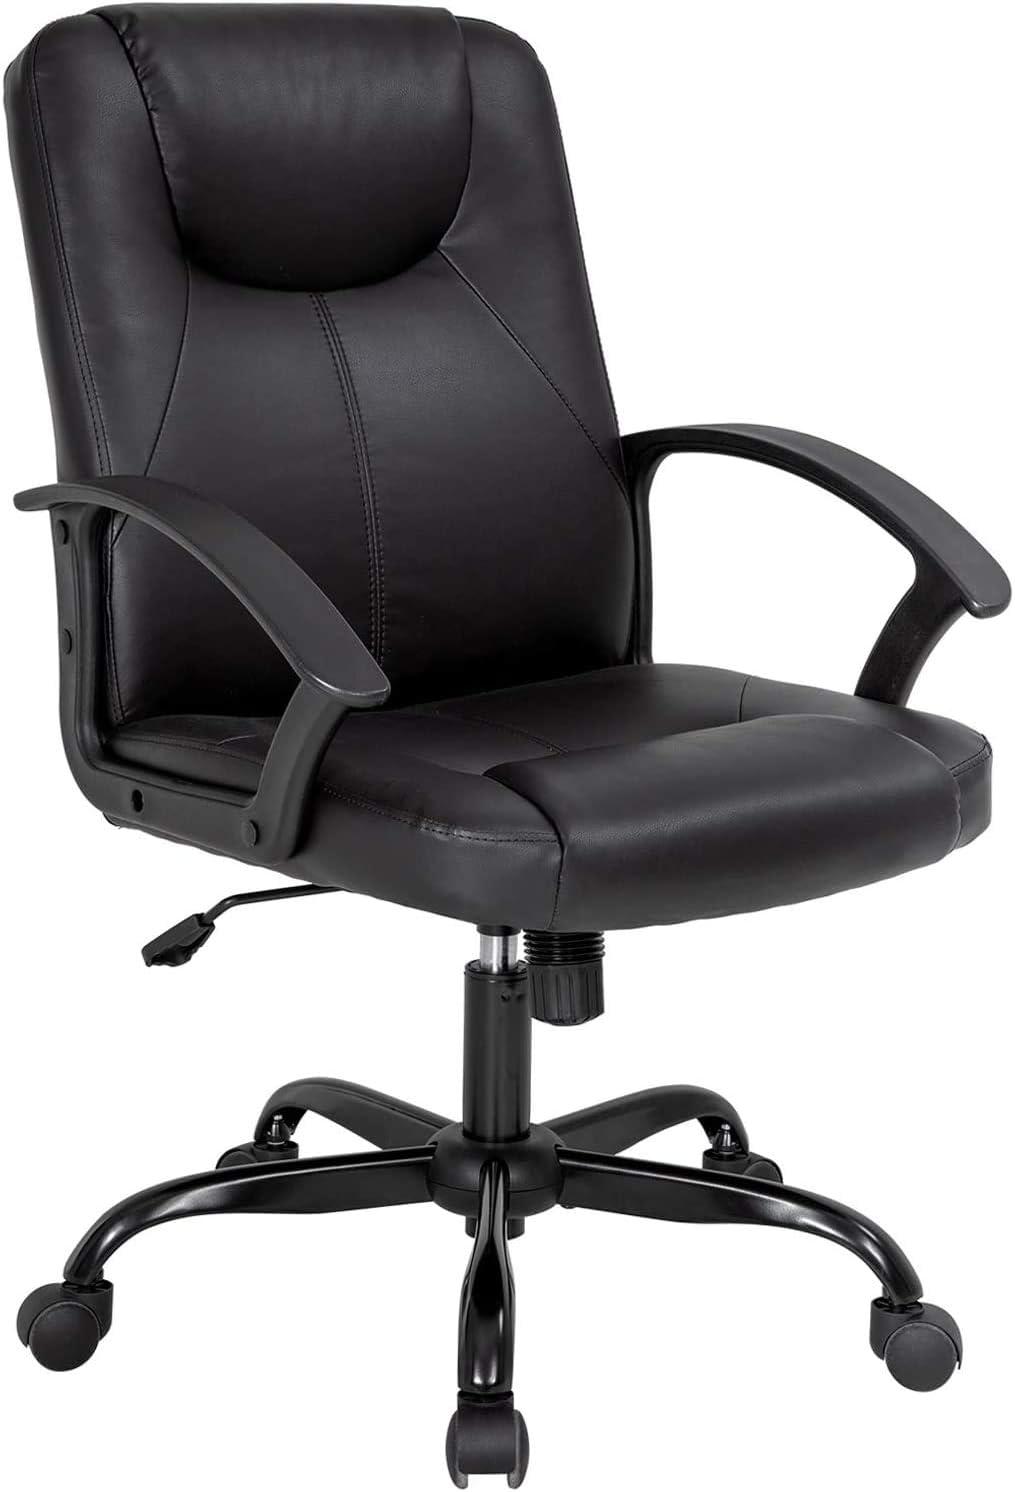 KOVALENTHOR Office Computer Desk Chair